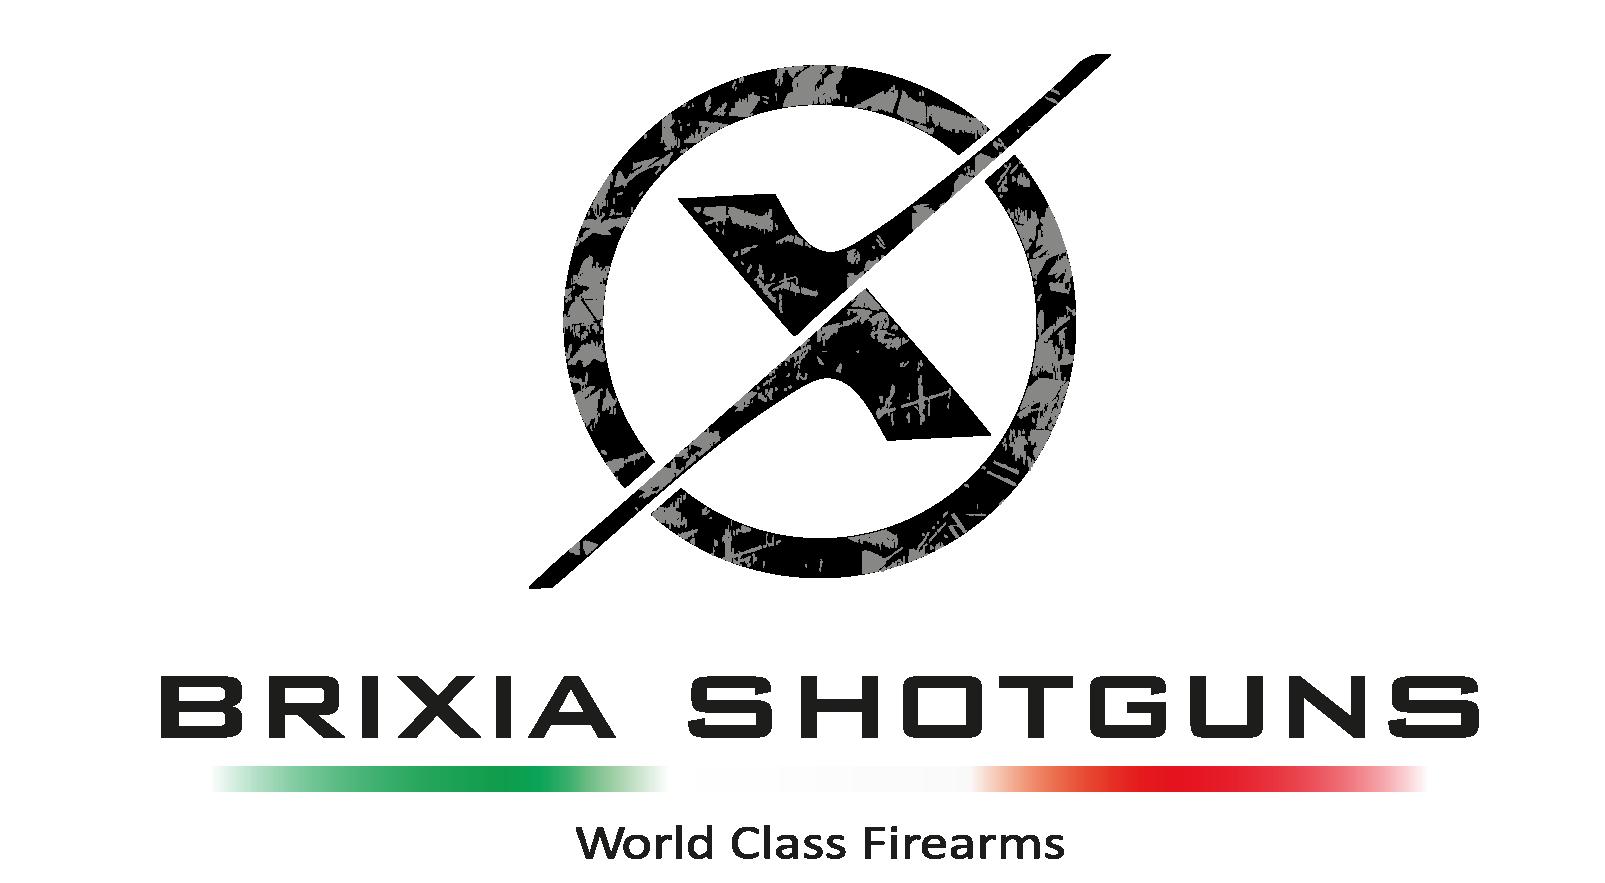 Brixia Shotguns